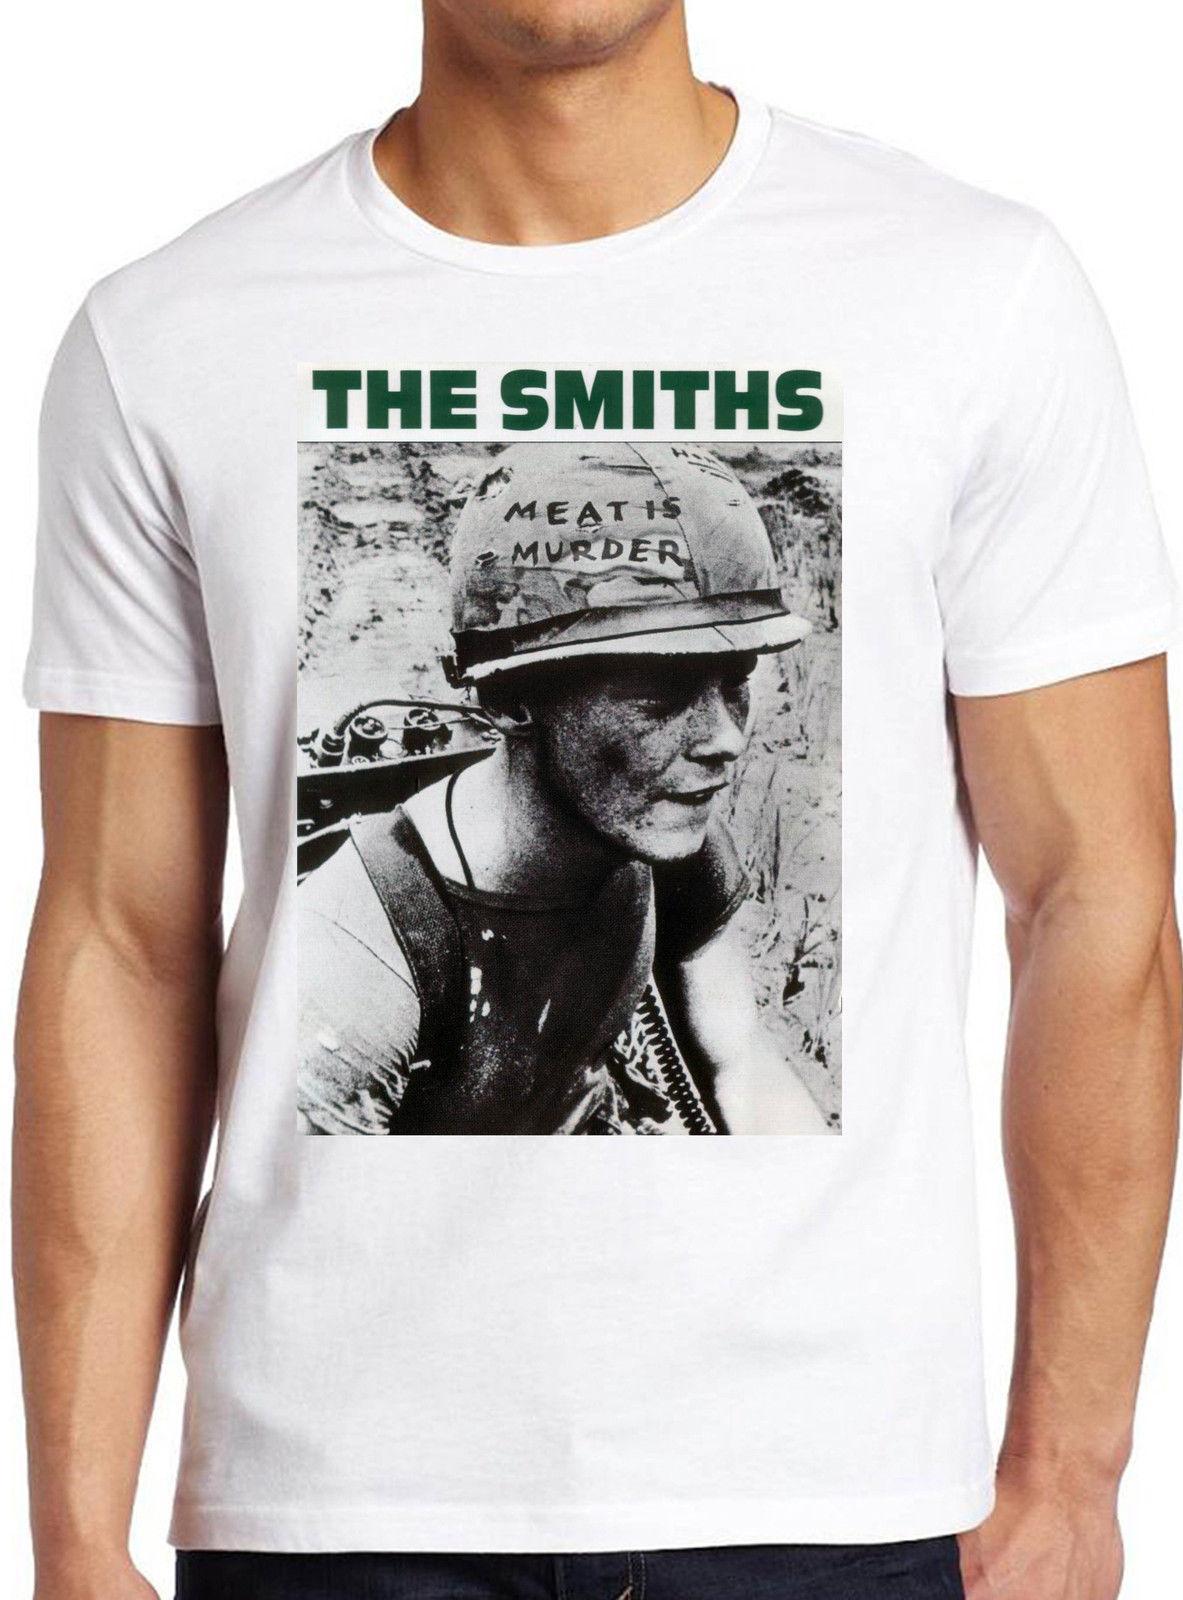 4c063c319119 The Smiths Meat Is Murder Alternative Rock Morrissey Men Women Unisex TShirt  256 Cloth T Shirt Shirt Site From Yubin3, $27.52| DHgate.Com